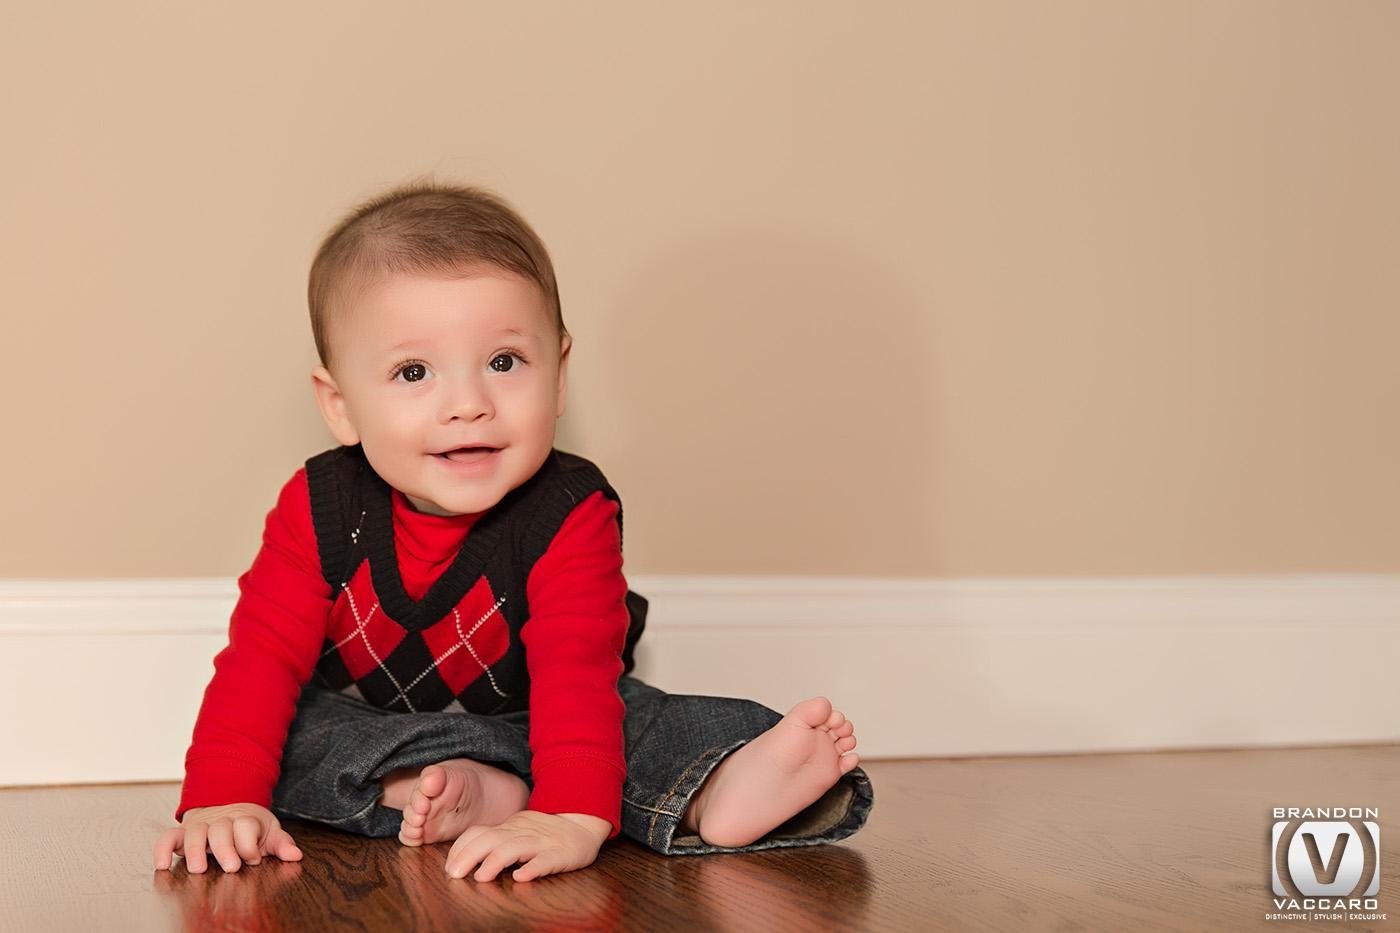 commercial-baby-photographer-brandon-vaccaro-baby-model - 015 copy copy.jpg